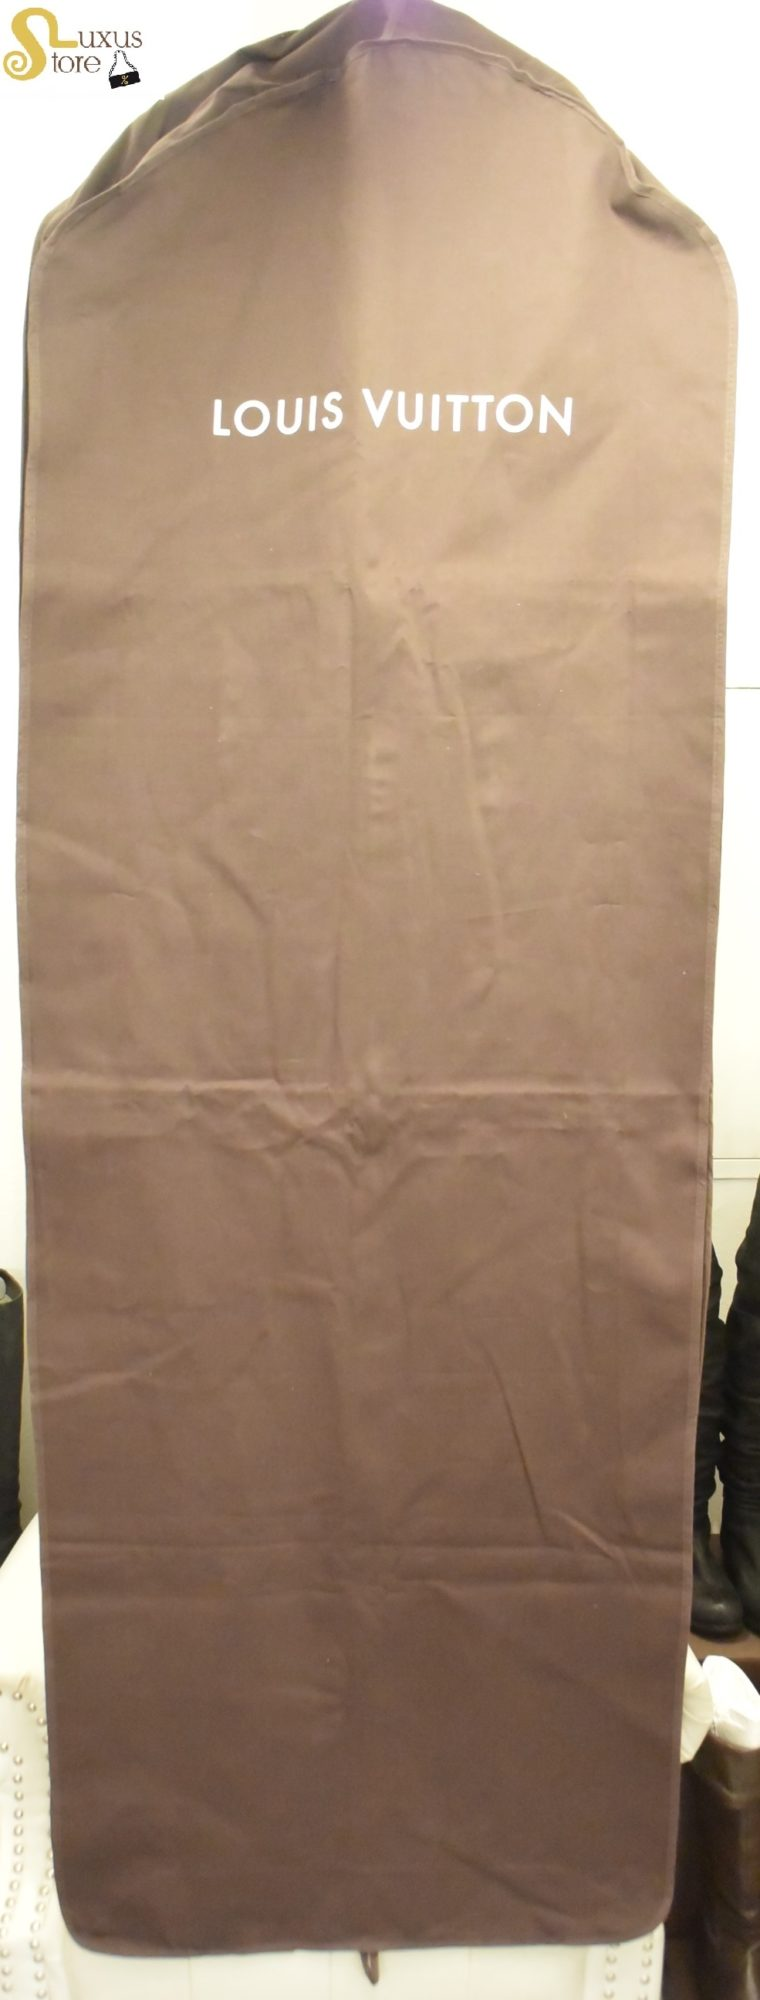 Louis Vuitton Kleiderhülle Kleidersack braun lang-14595